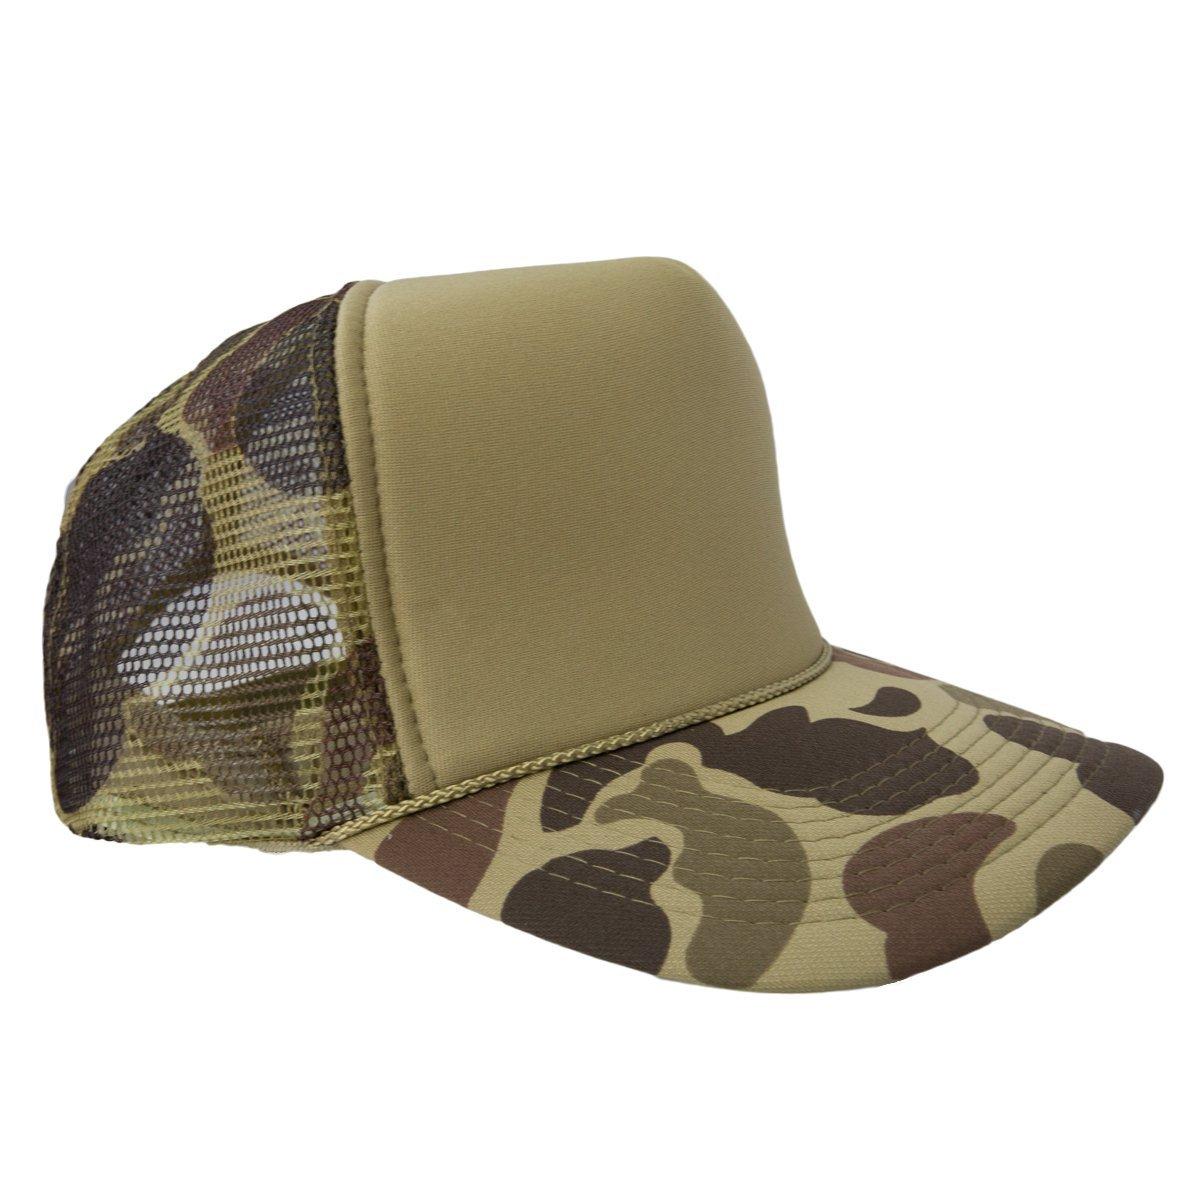 957474fd Buy Camo Hunters Hat, #1 Hunting Gifts For Men! Best For Duck & Deer ...